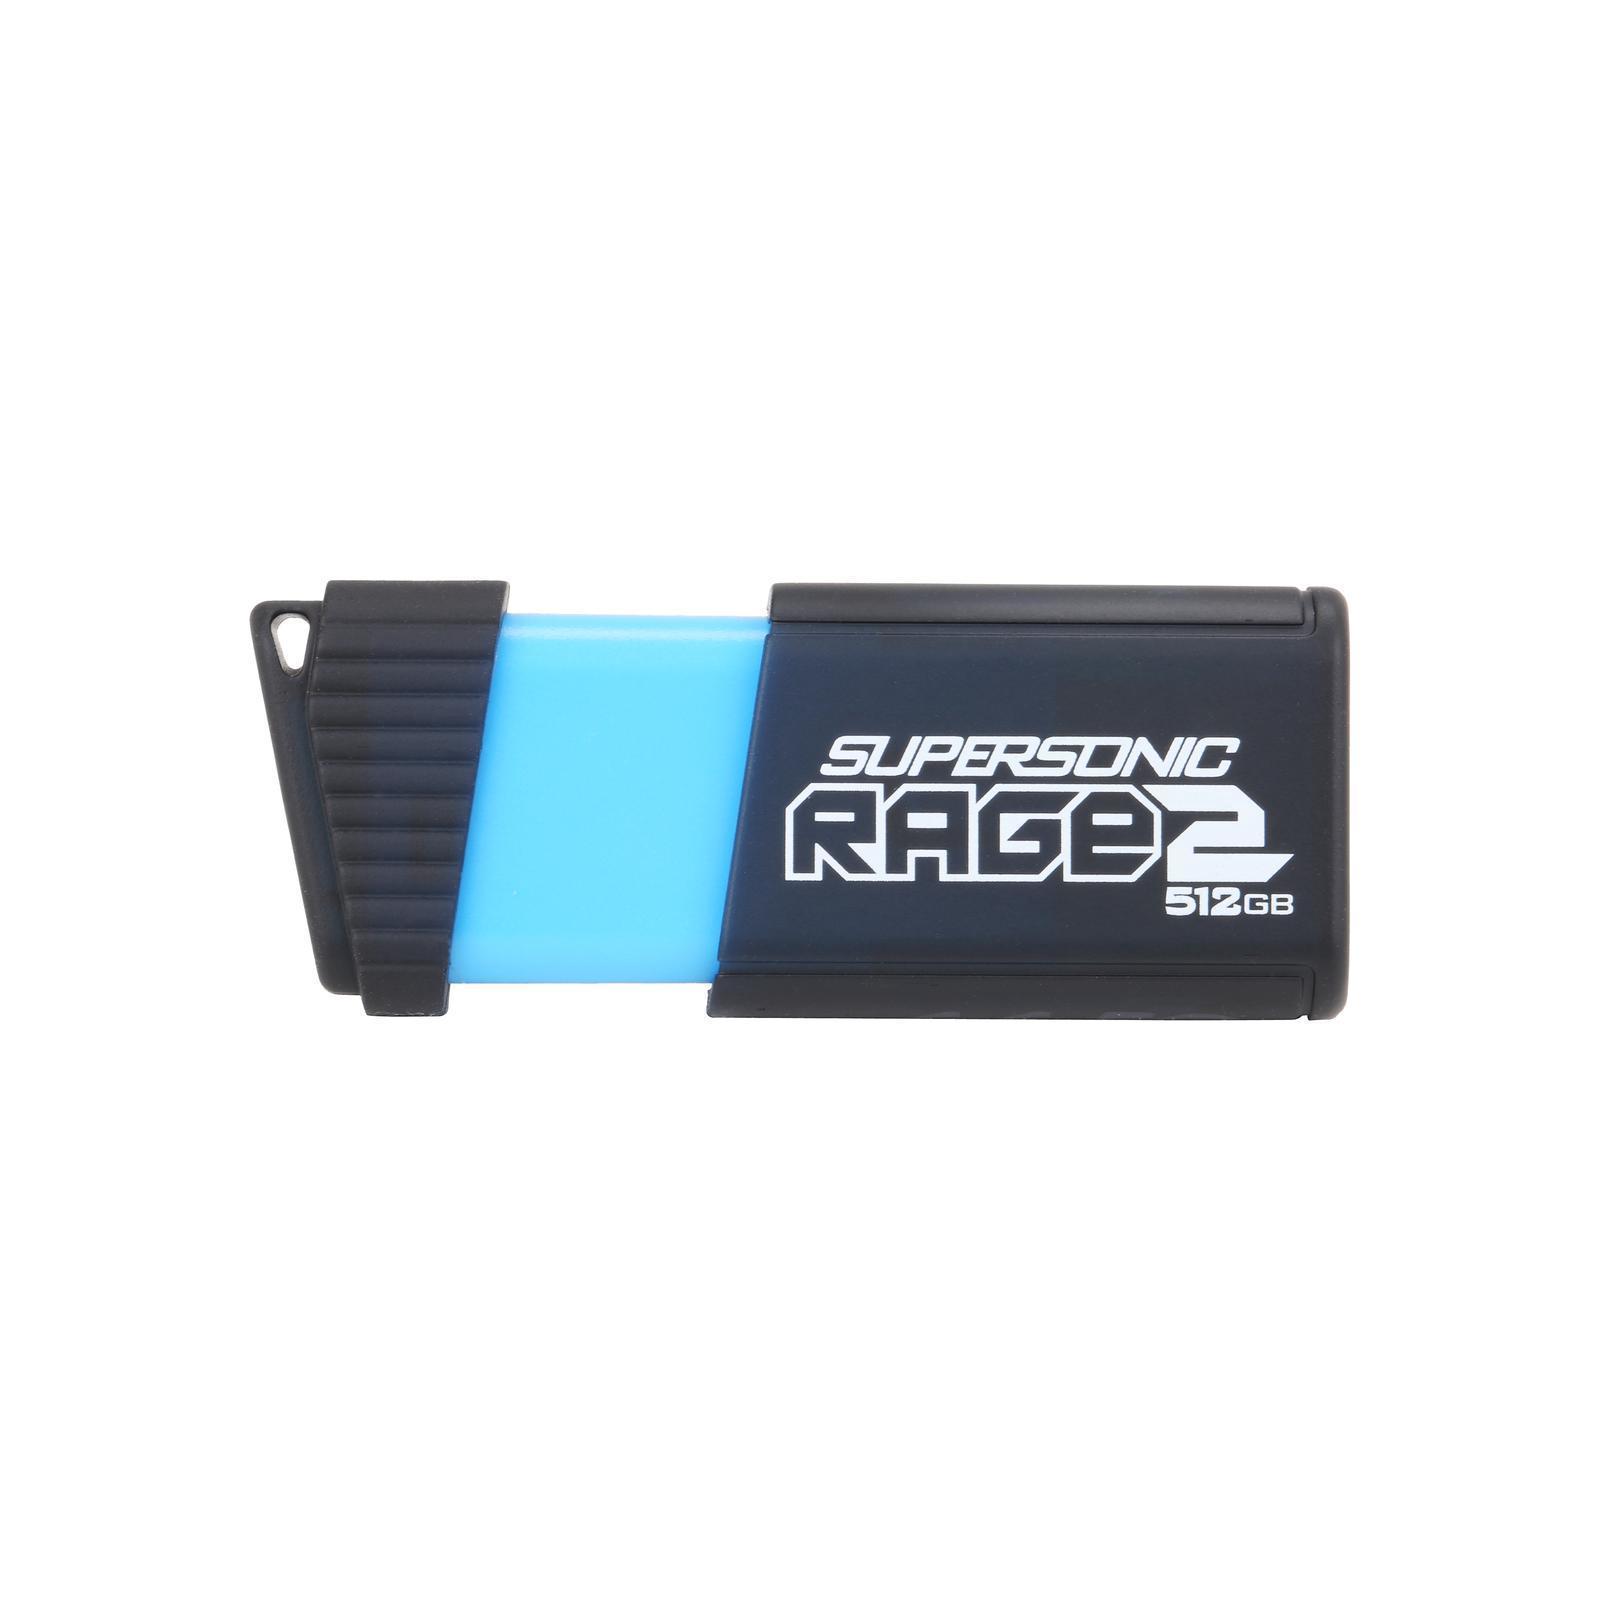 USB флеш накопитель Patriot 512GB Supersonic Rage 2 USB 3.1 (PEF512GSR2USB)